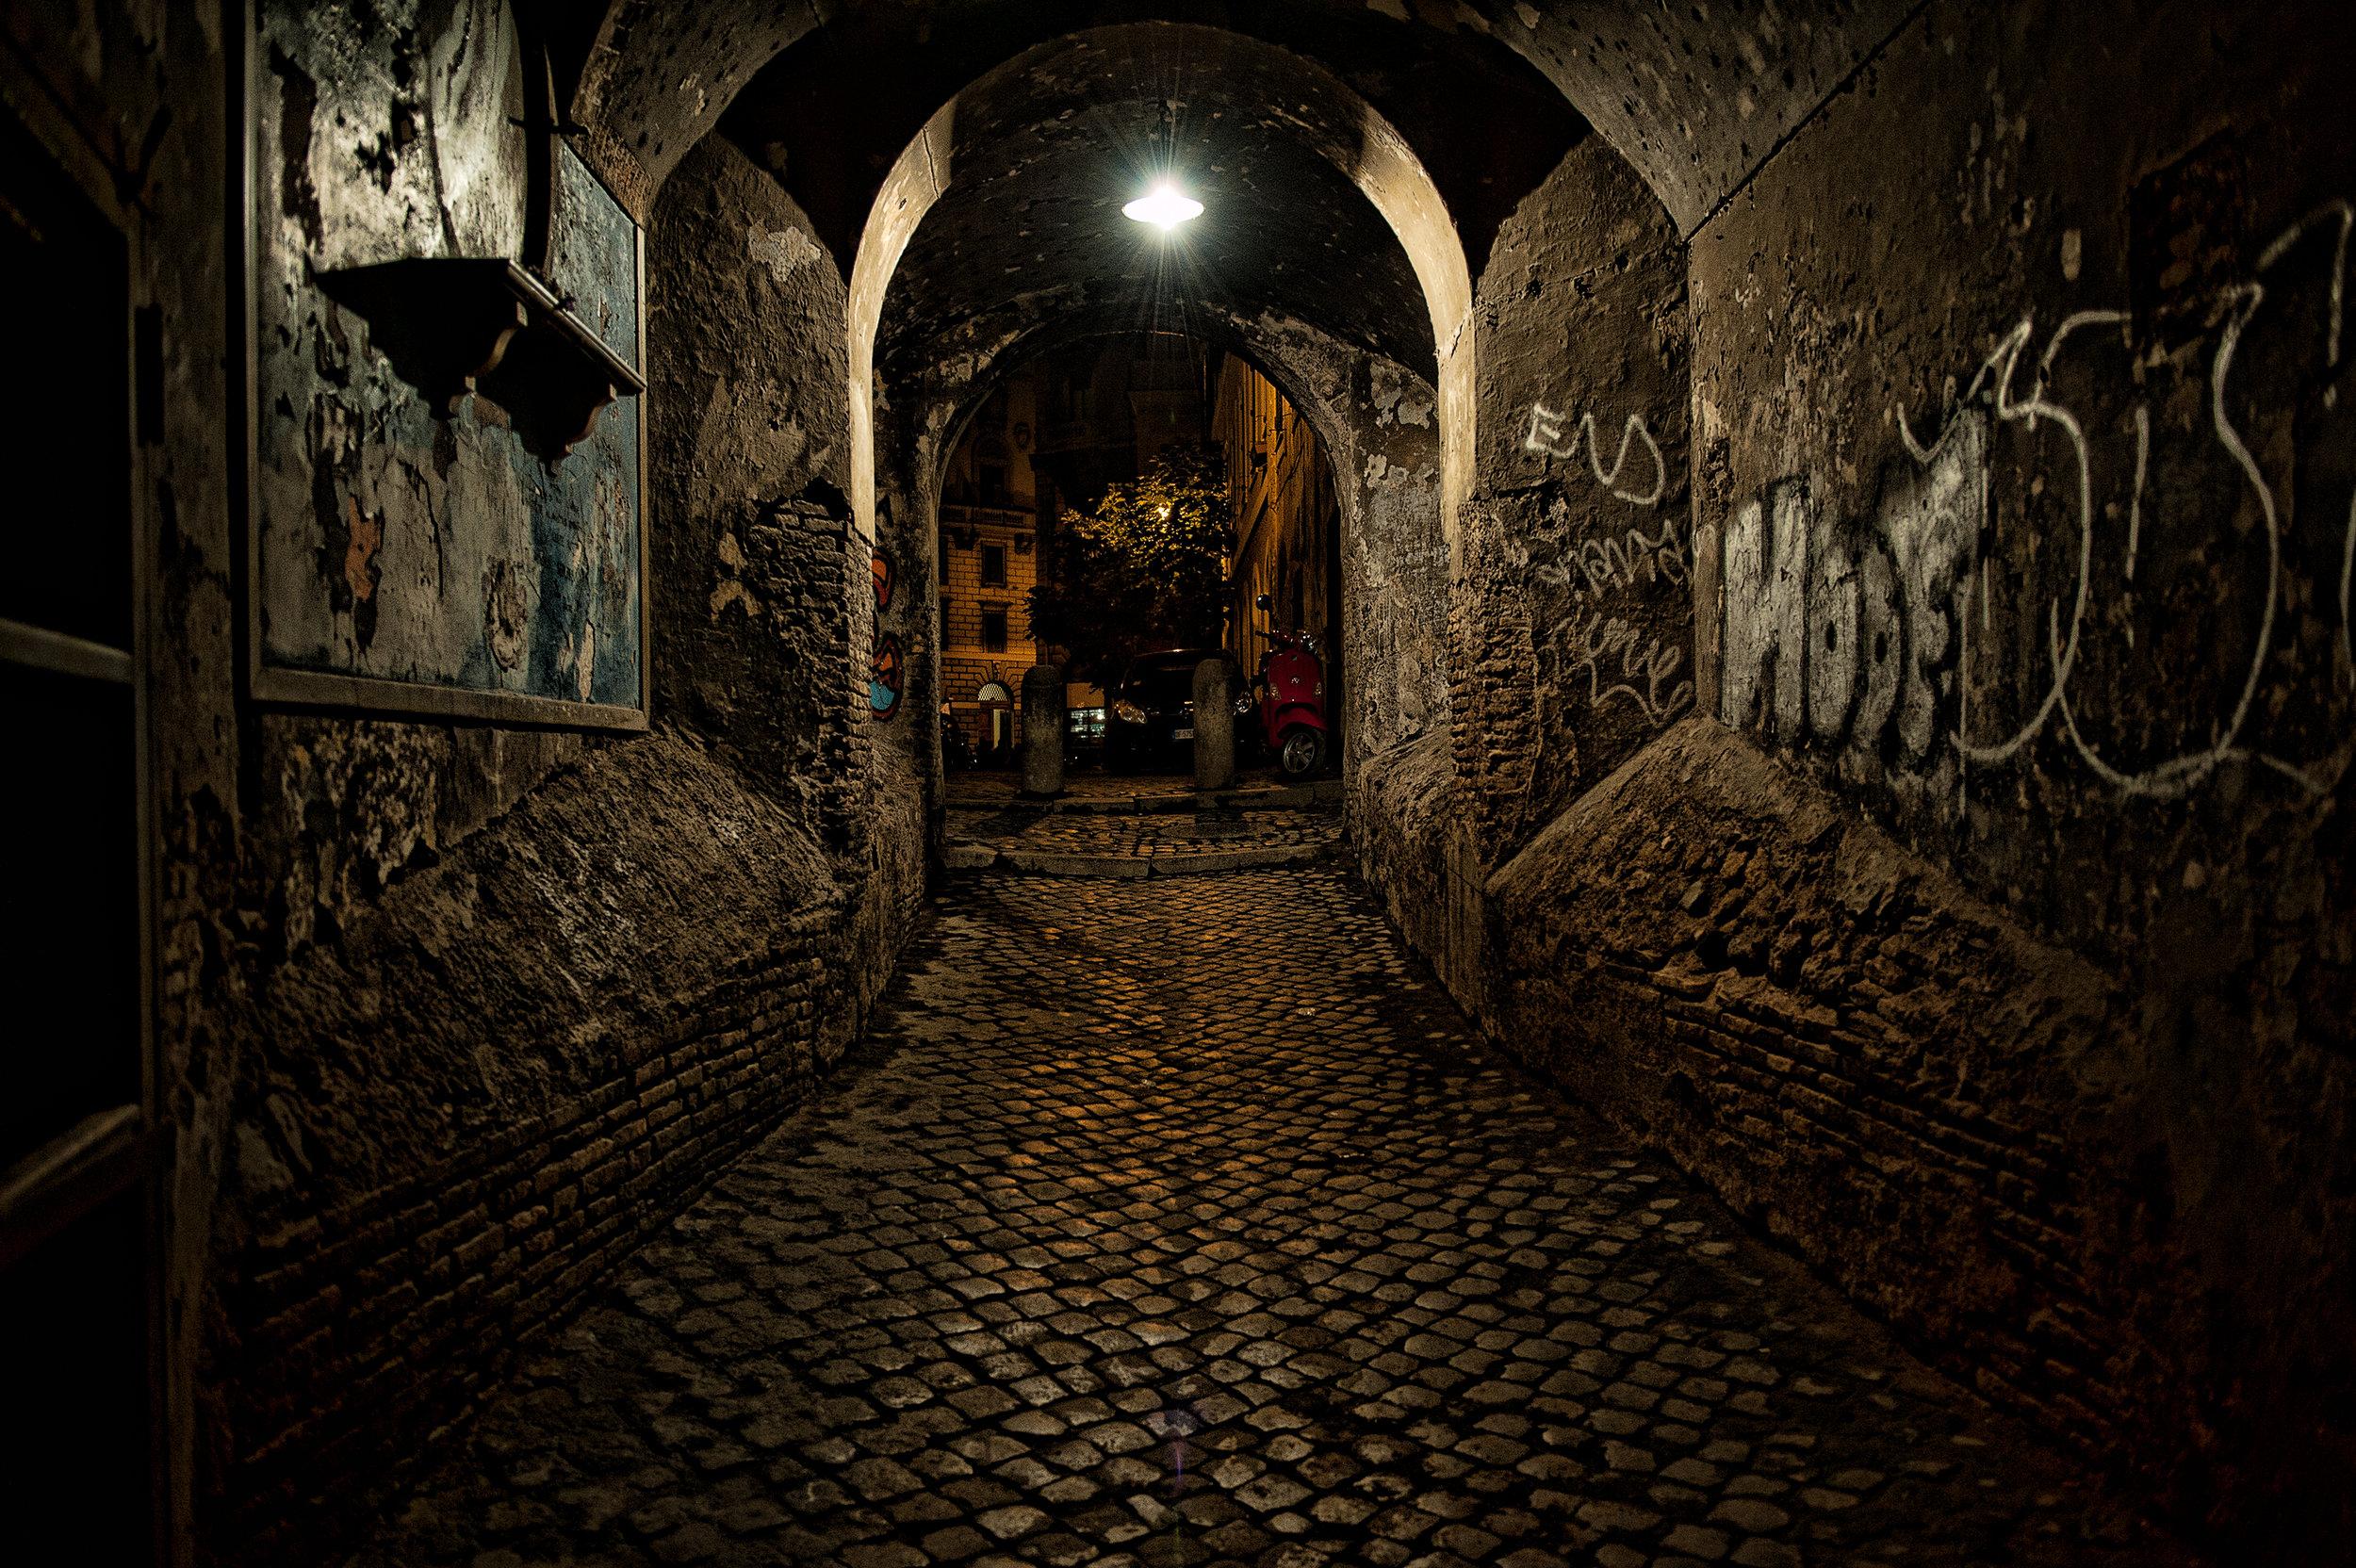 Italy-John Bardell-0800a.jpg